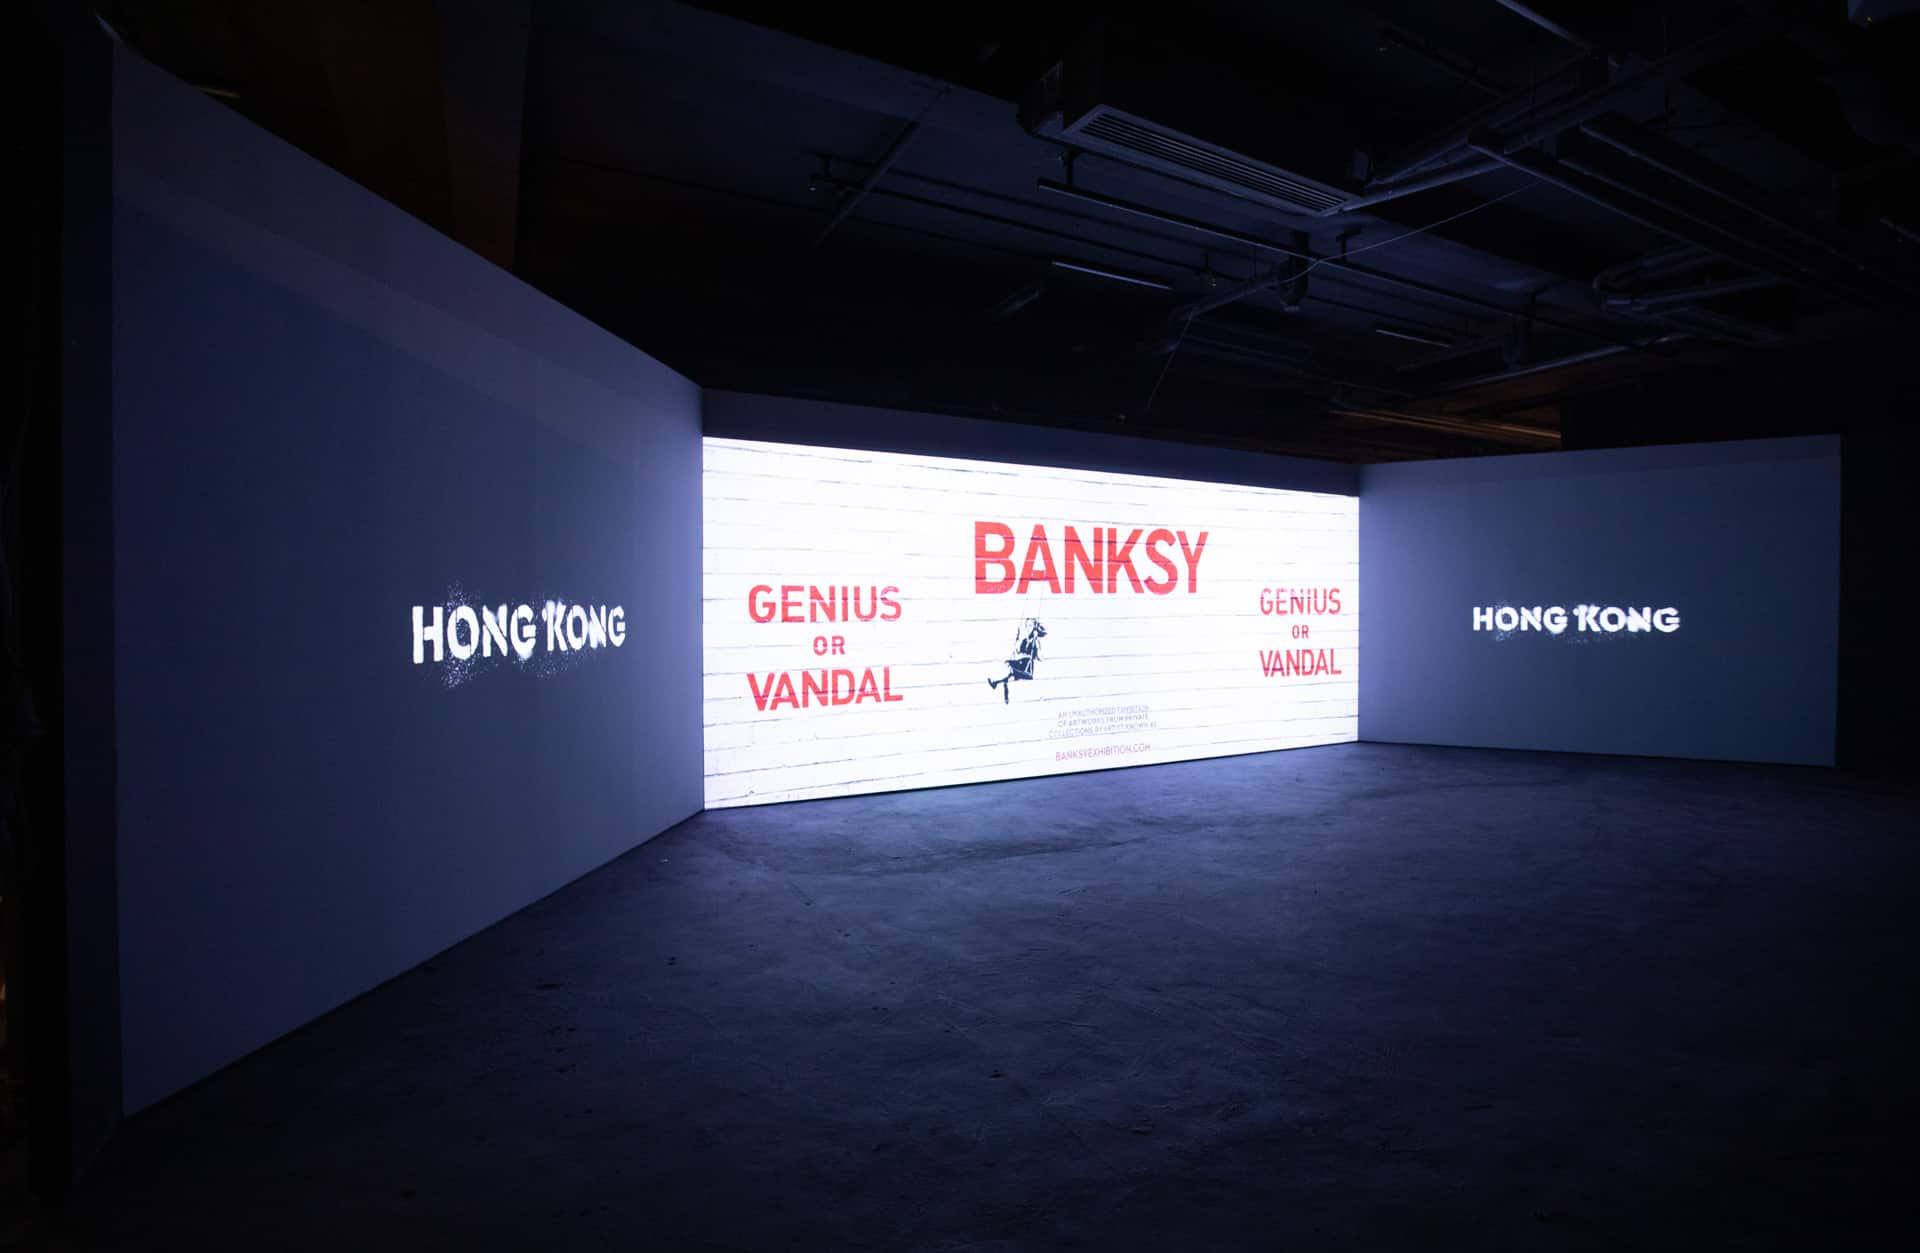 「Banksy: Genius or Vandal」世界巡迴展覽香港站 聲音及形象裝置透露Banksy撲朔迷離的身世。